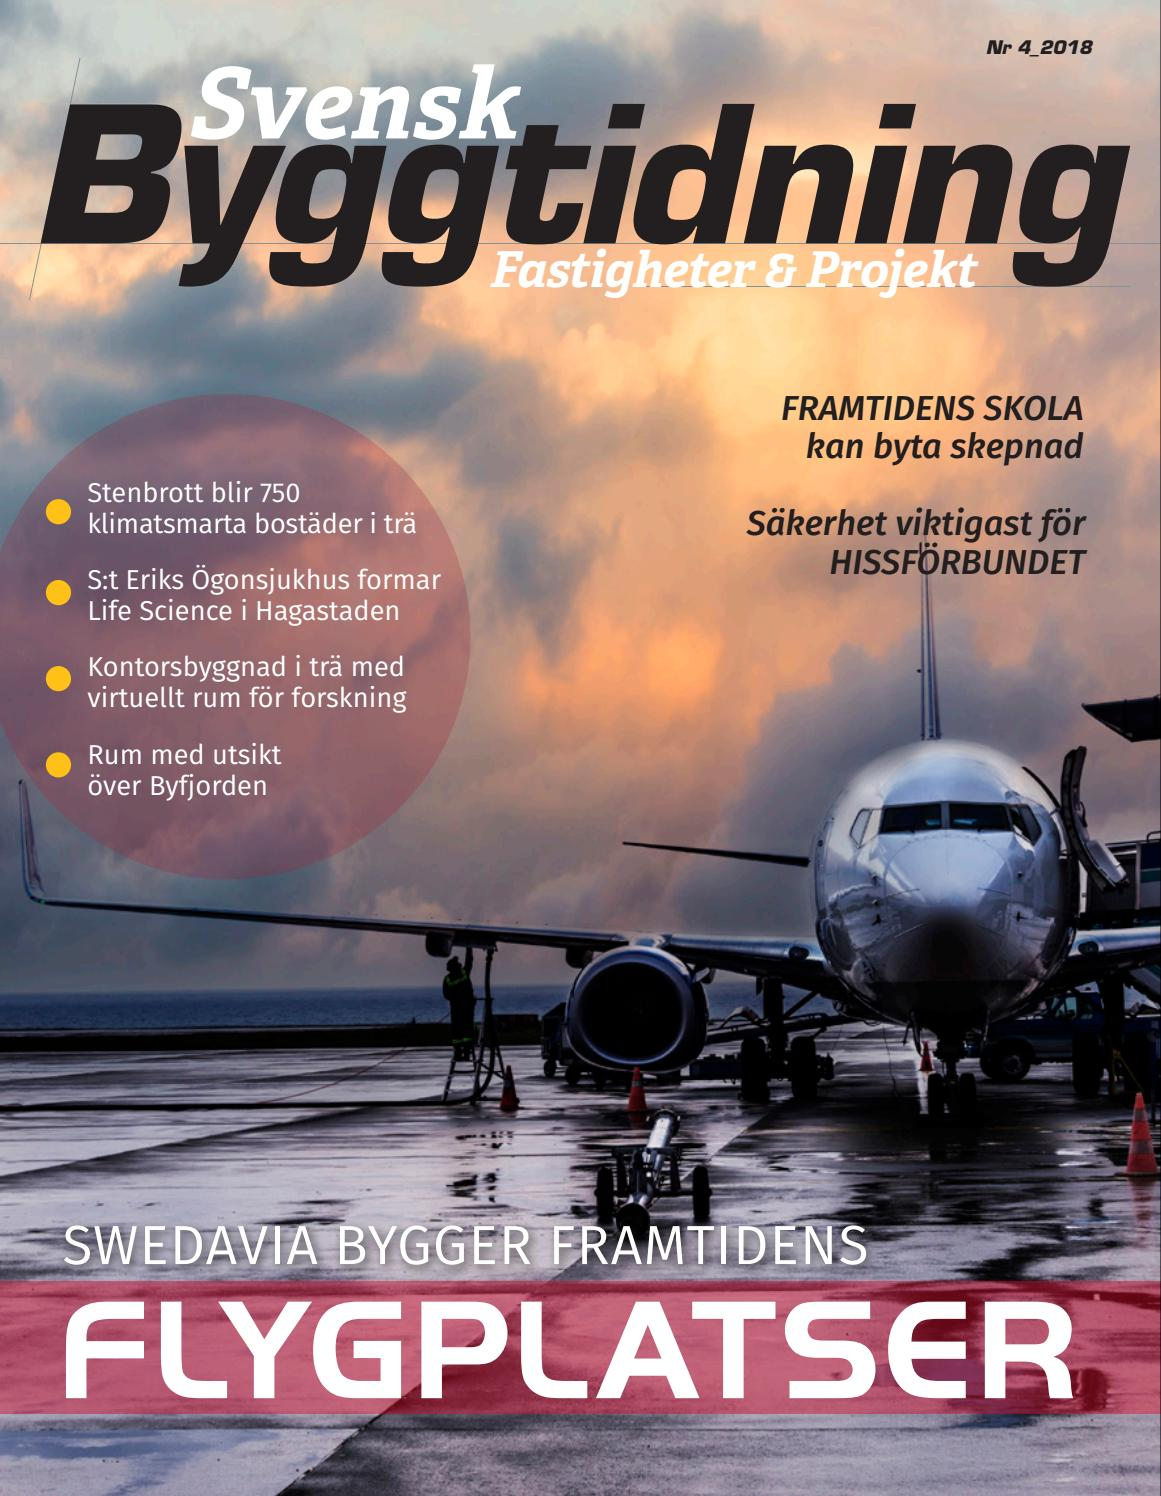 Svensk Byggtidning 4/2018 by Stordåhd Kommunikation AB - issuu